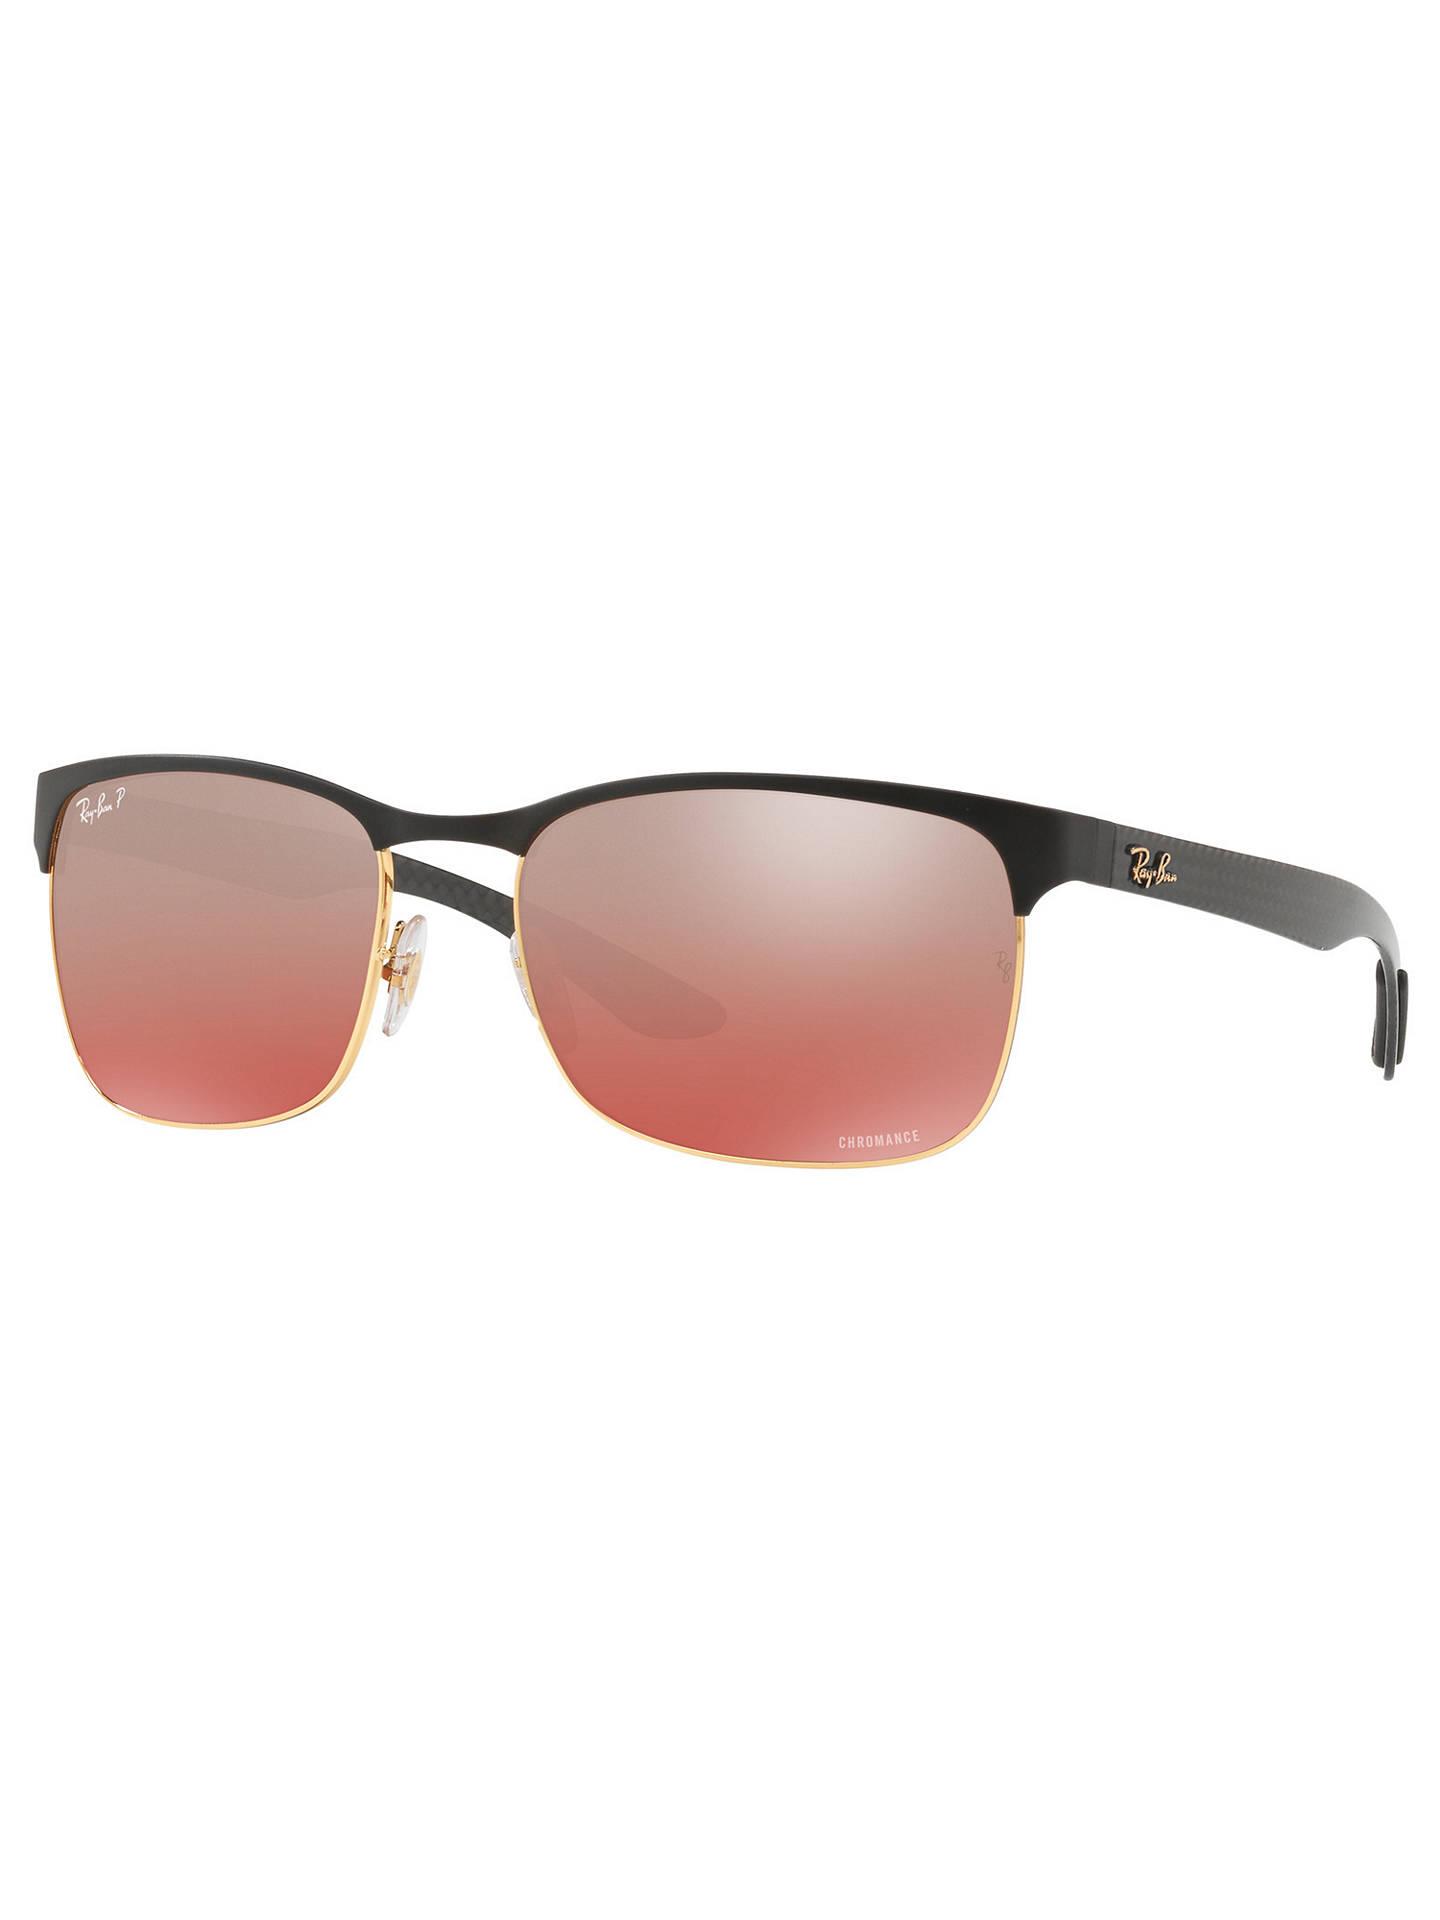 7610cd2fb6b112 Buy Ray-Ban RB8319 Polarised Rectangular Sunglasses, Black/Pink Gradient  Online at johnlewis ...